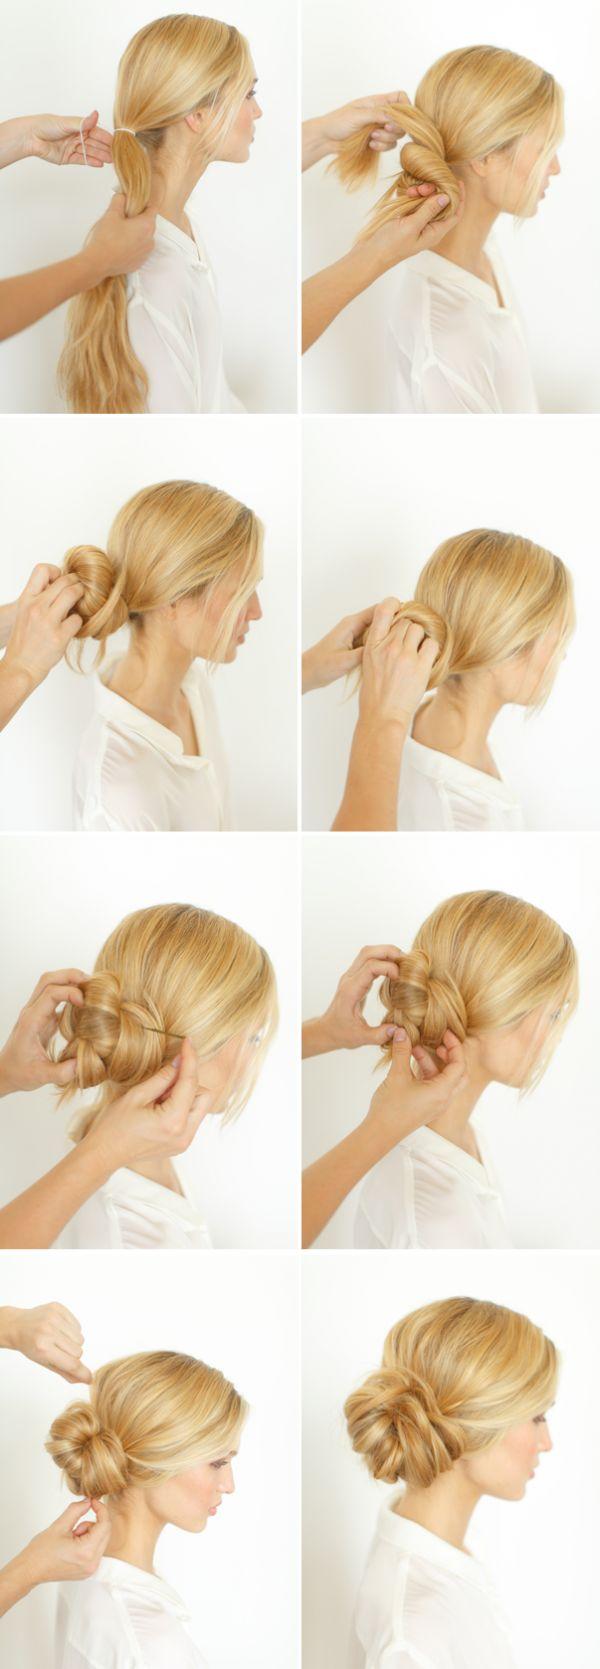 Hair Tutorials Knot Updo Hairstyles Pretty Designs